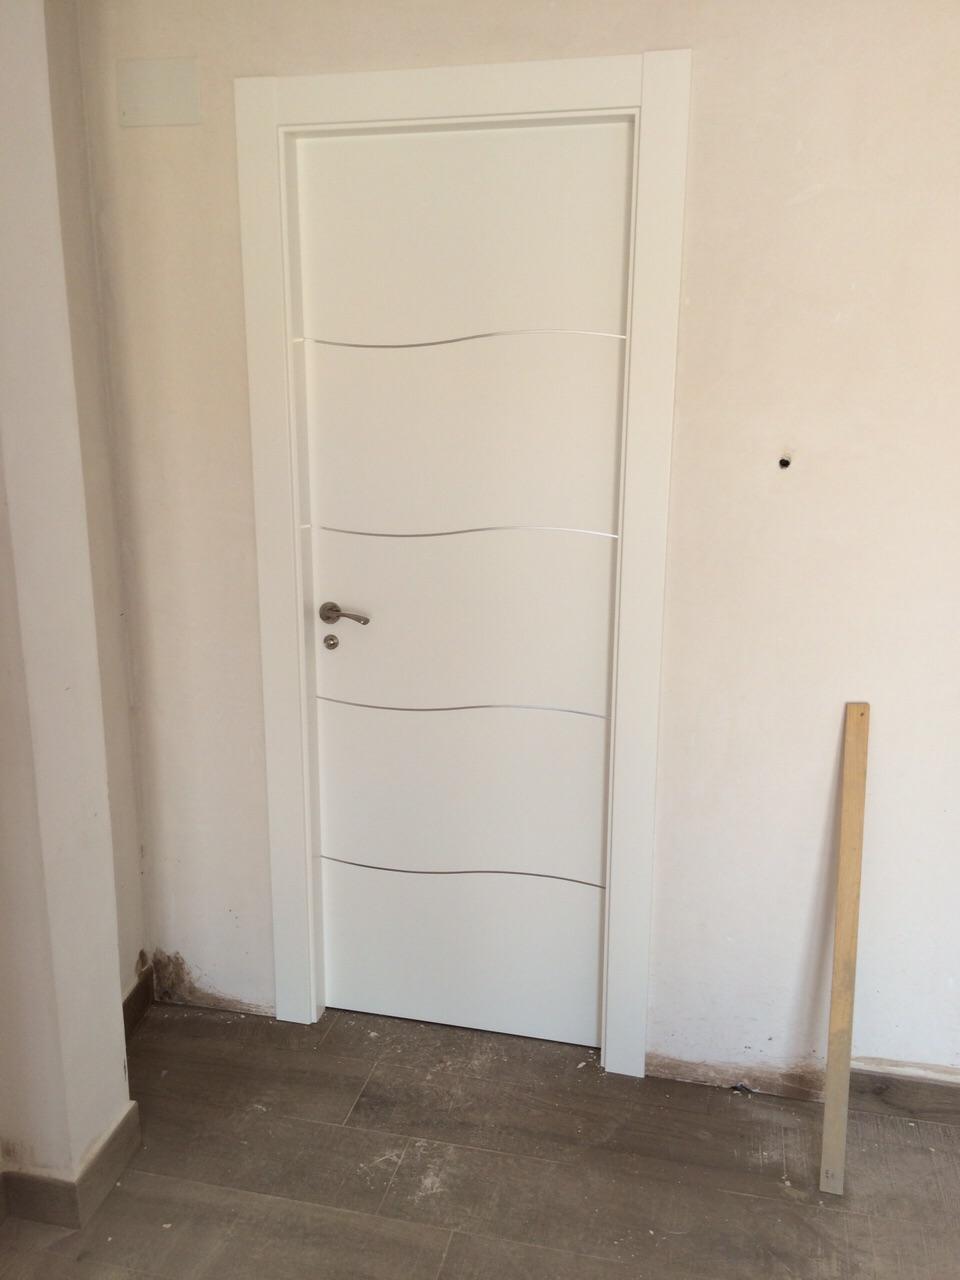 Puertas lacadas mod alho 4 c aluminio ondulado puertas - Puertas blancas exterior ...